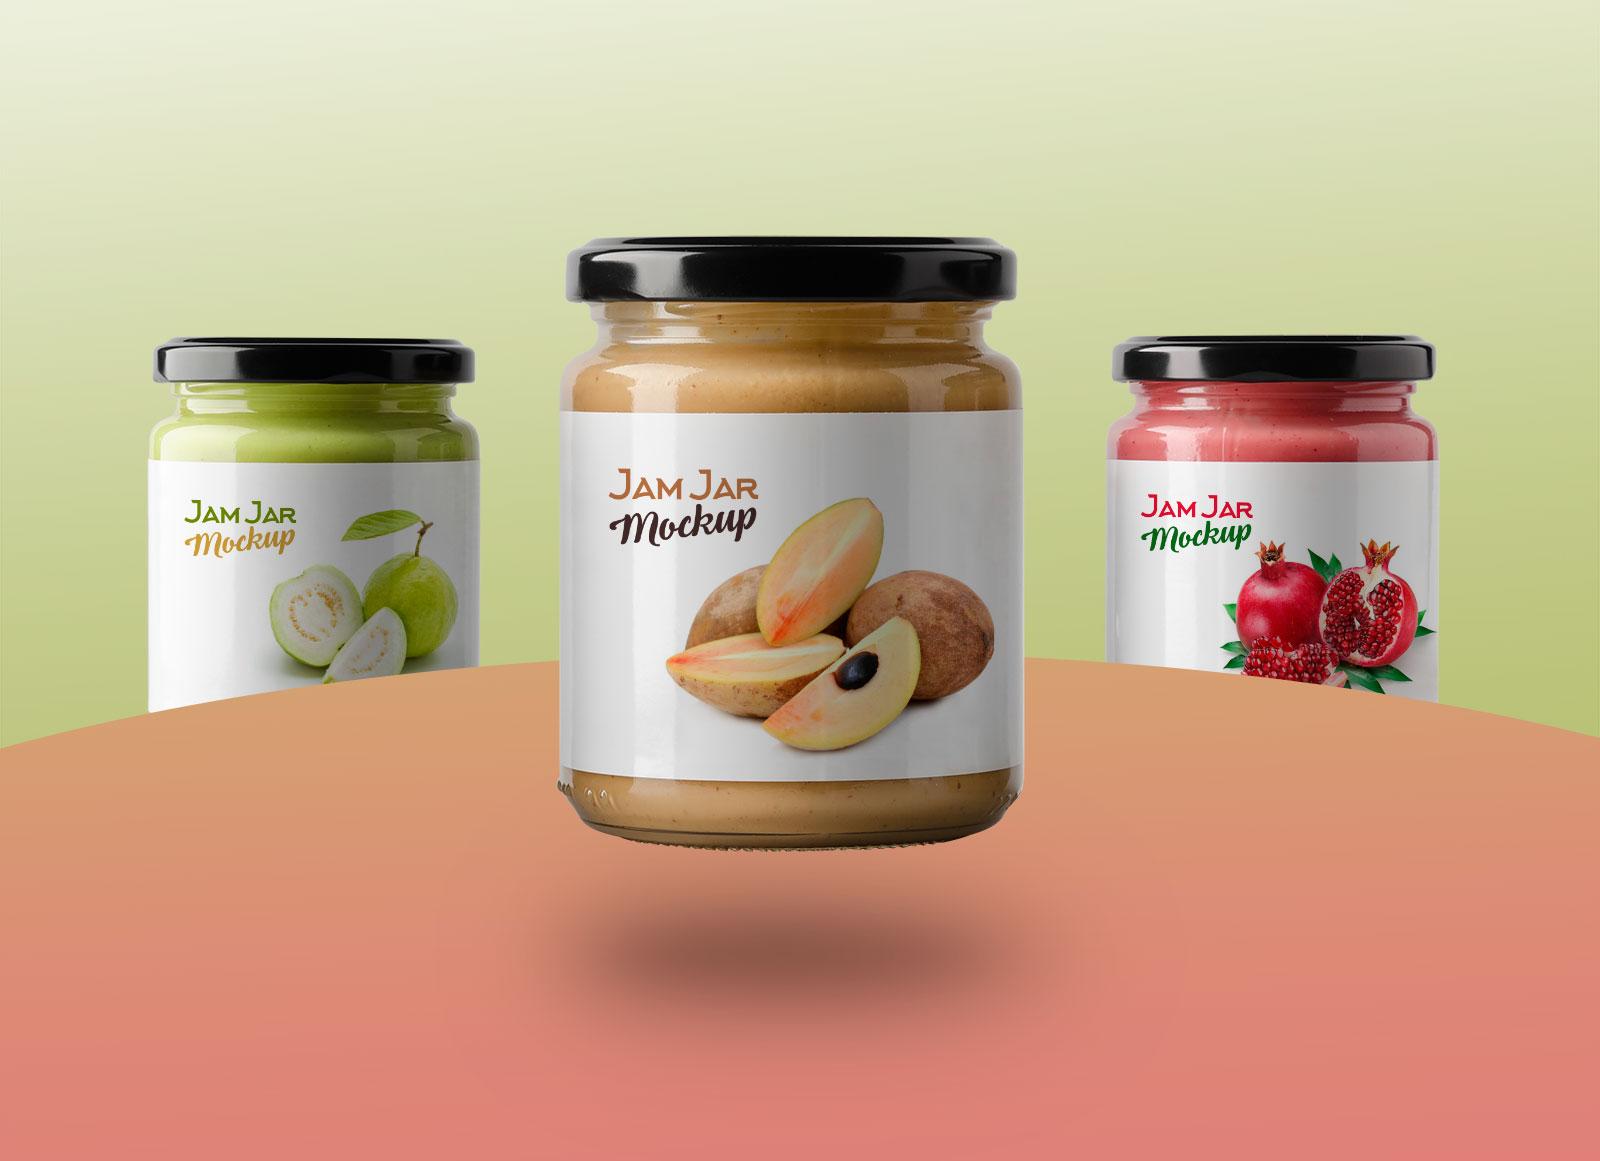 Free-3-glass-Jam-jars-Bottle-mockup-PSD